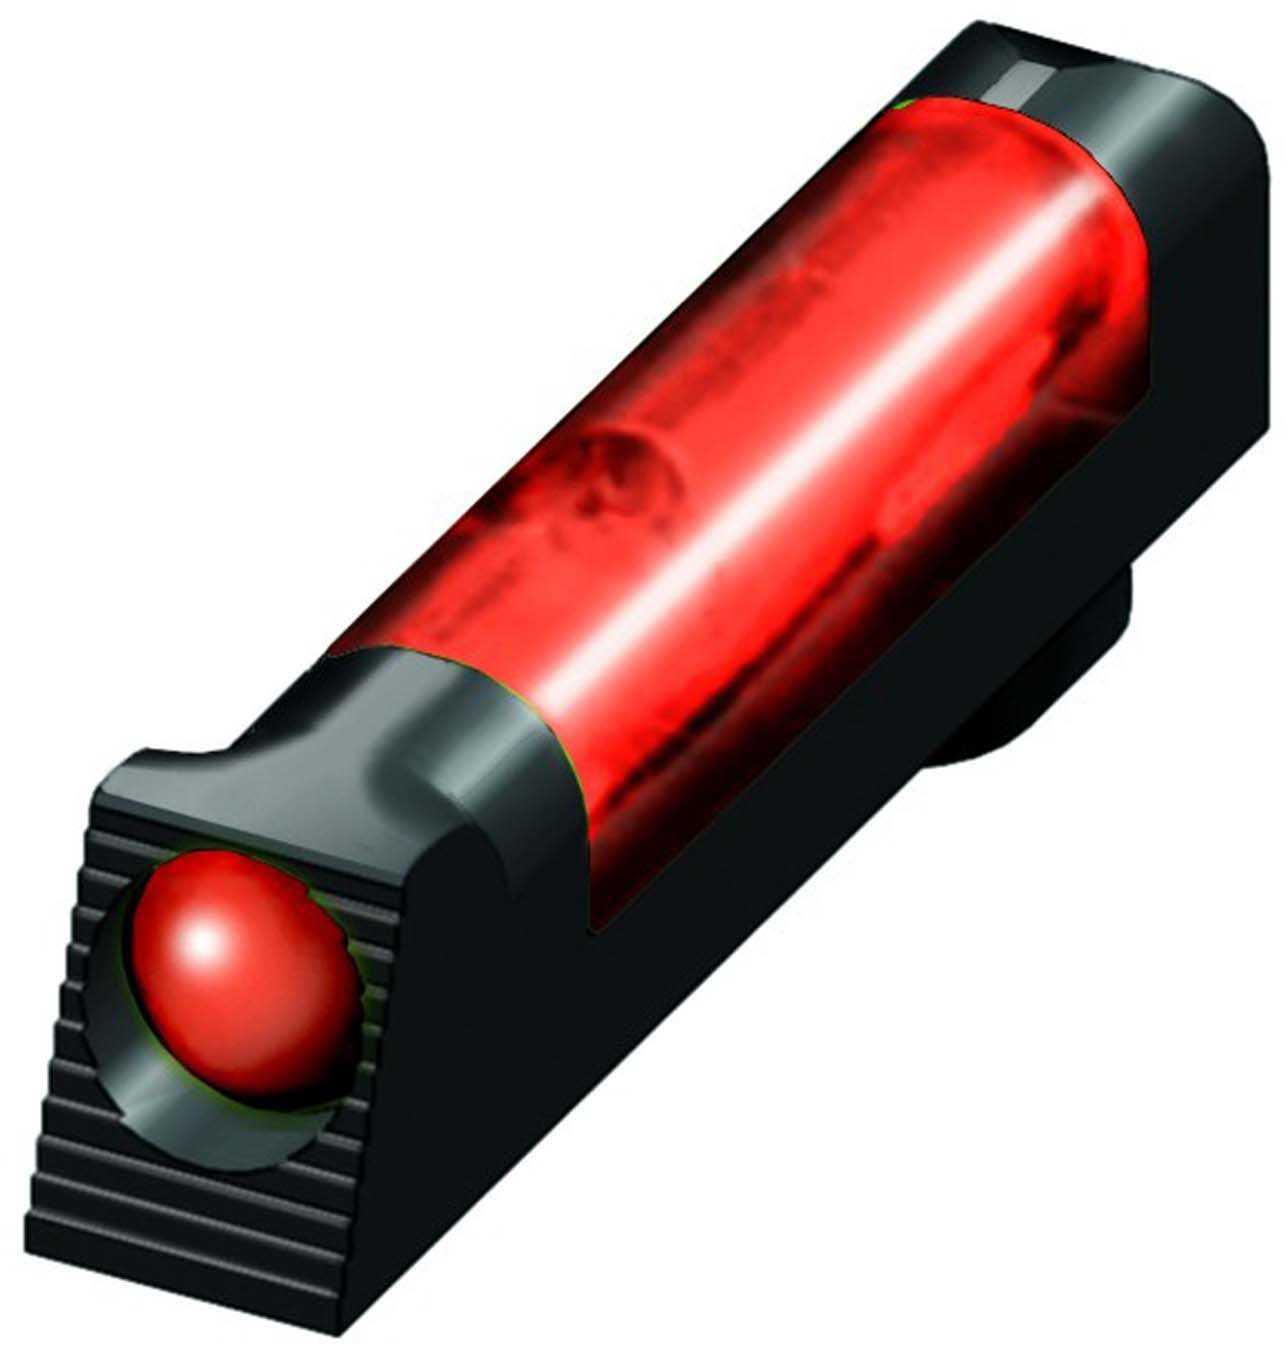 HiViz Sight Systems Hi-Viz Sight All Glocks Red Front Only GL2009-R